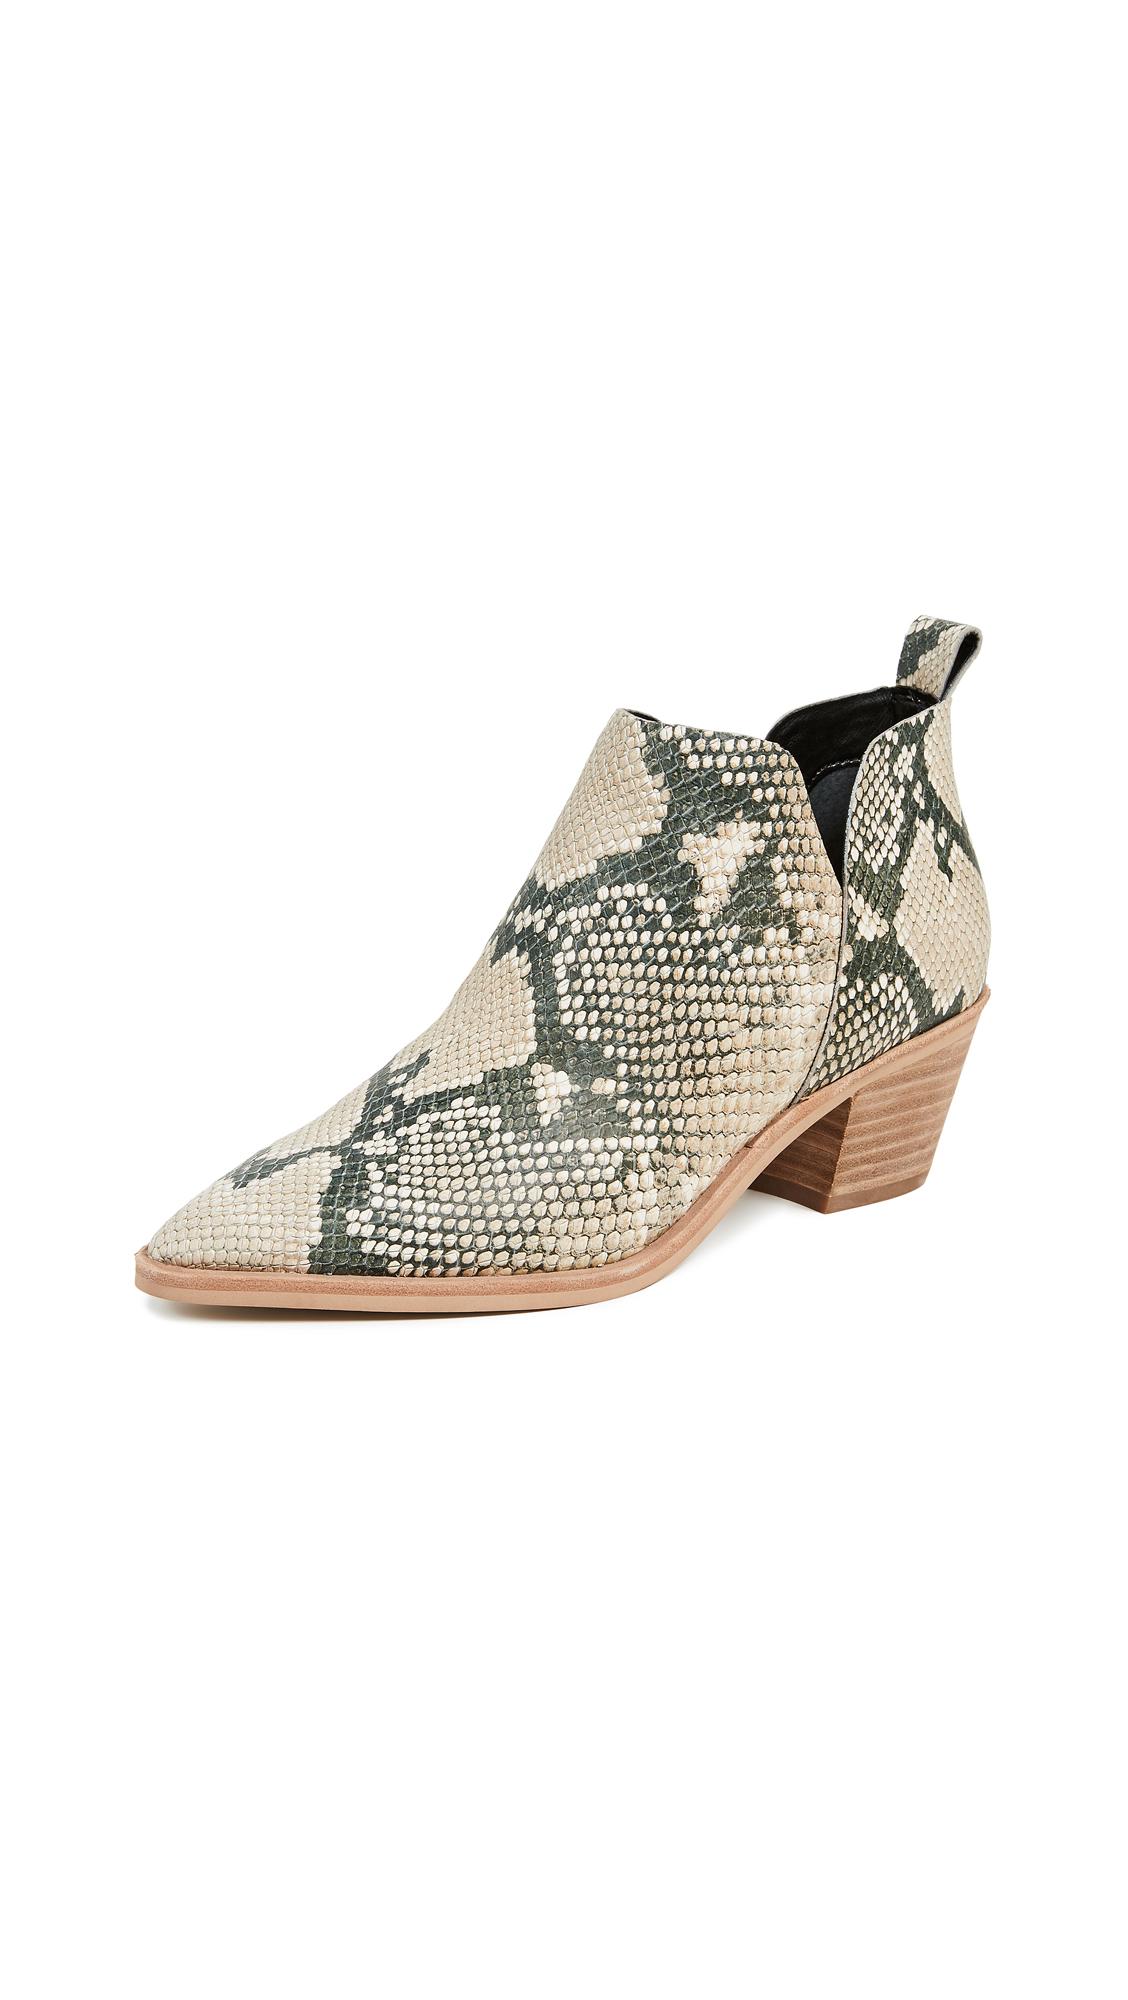 Dolce Vita Sonni Block Heel Booties - Snake Print